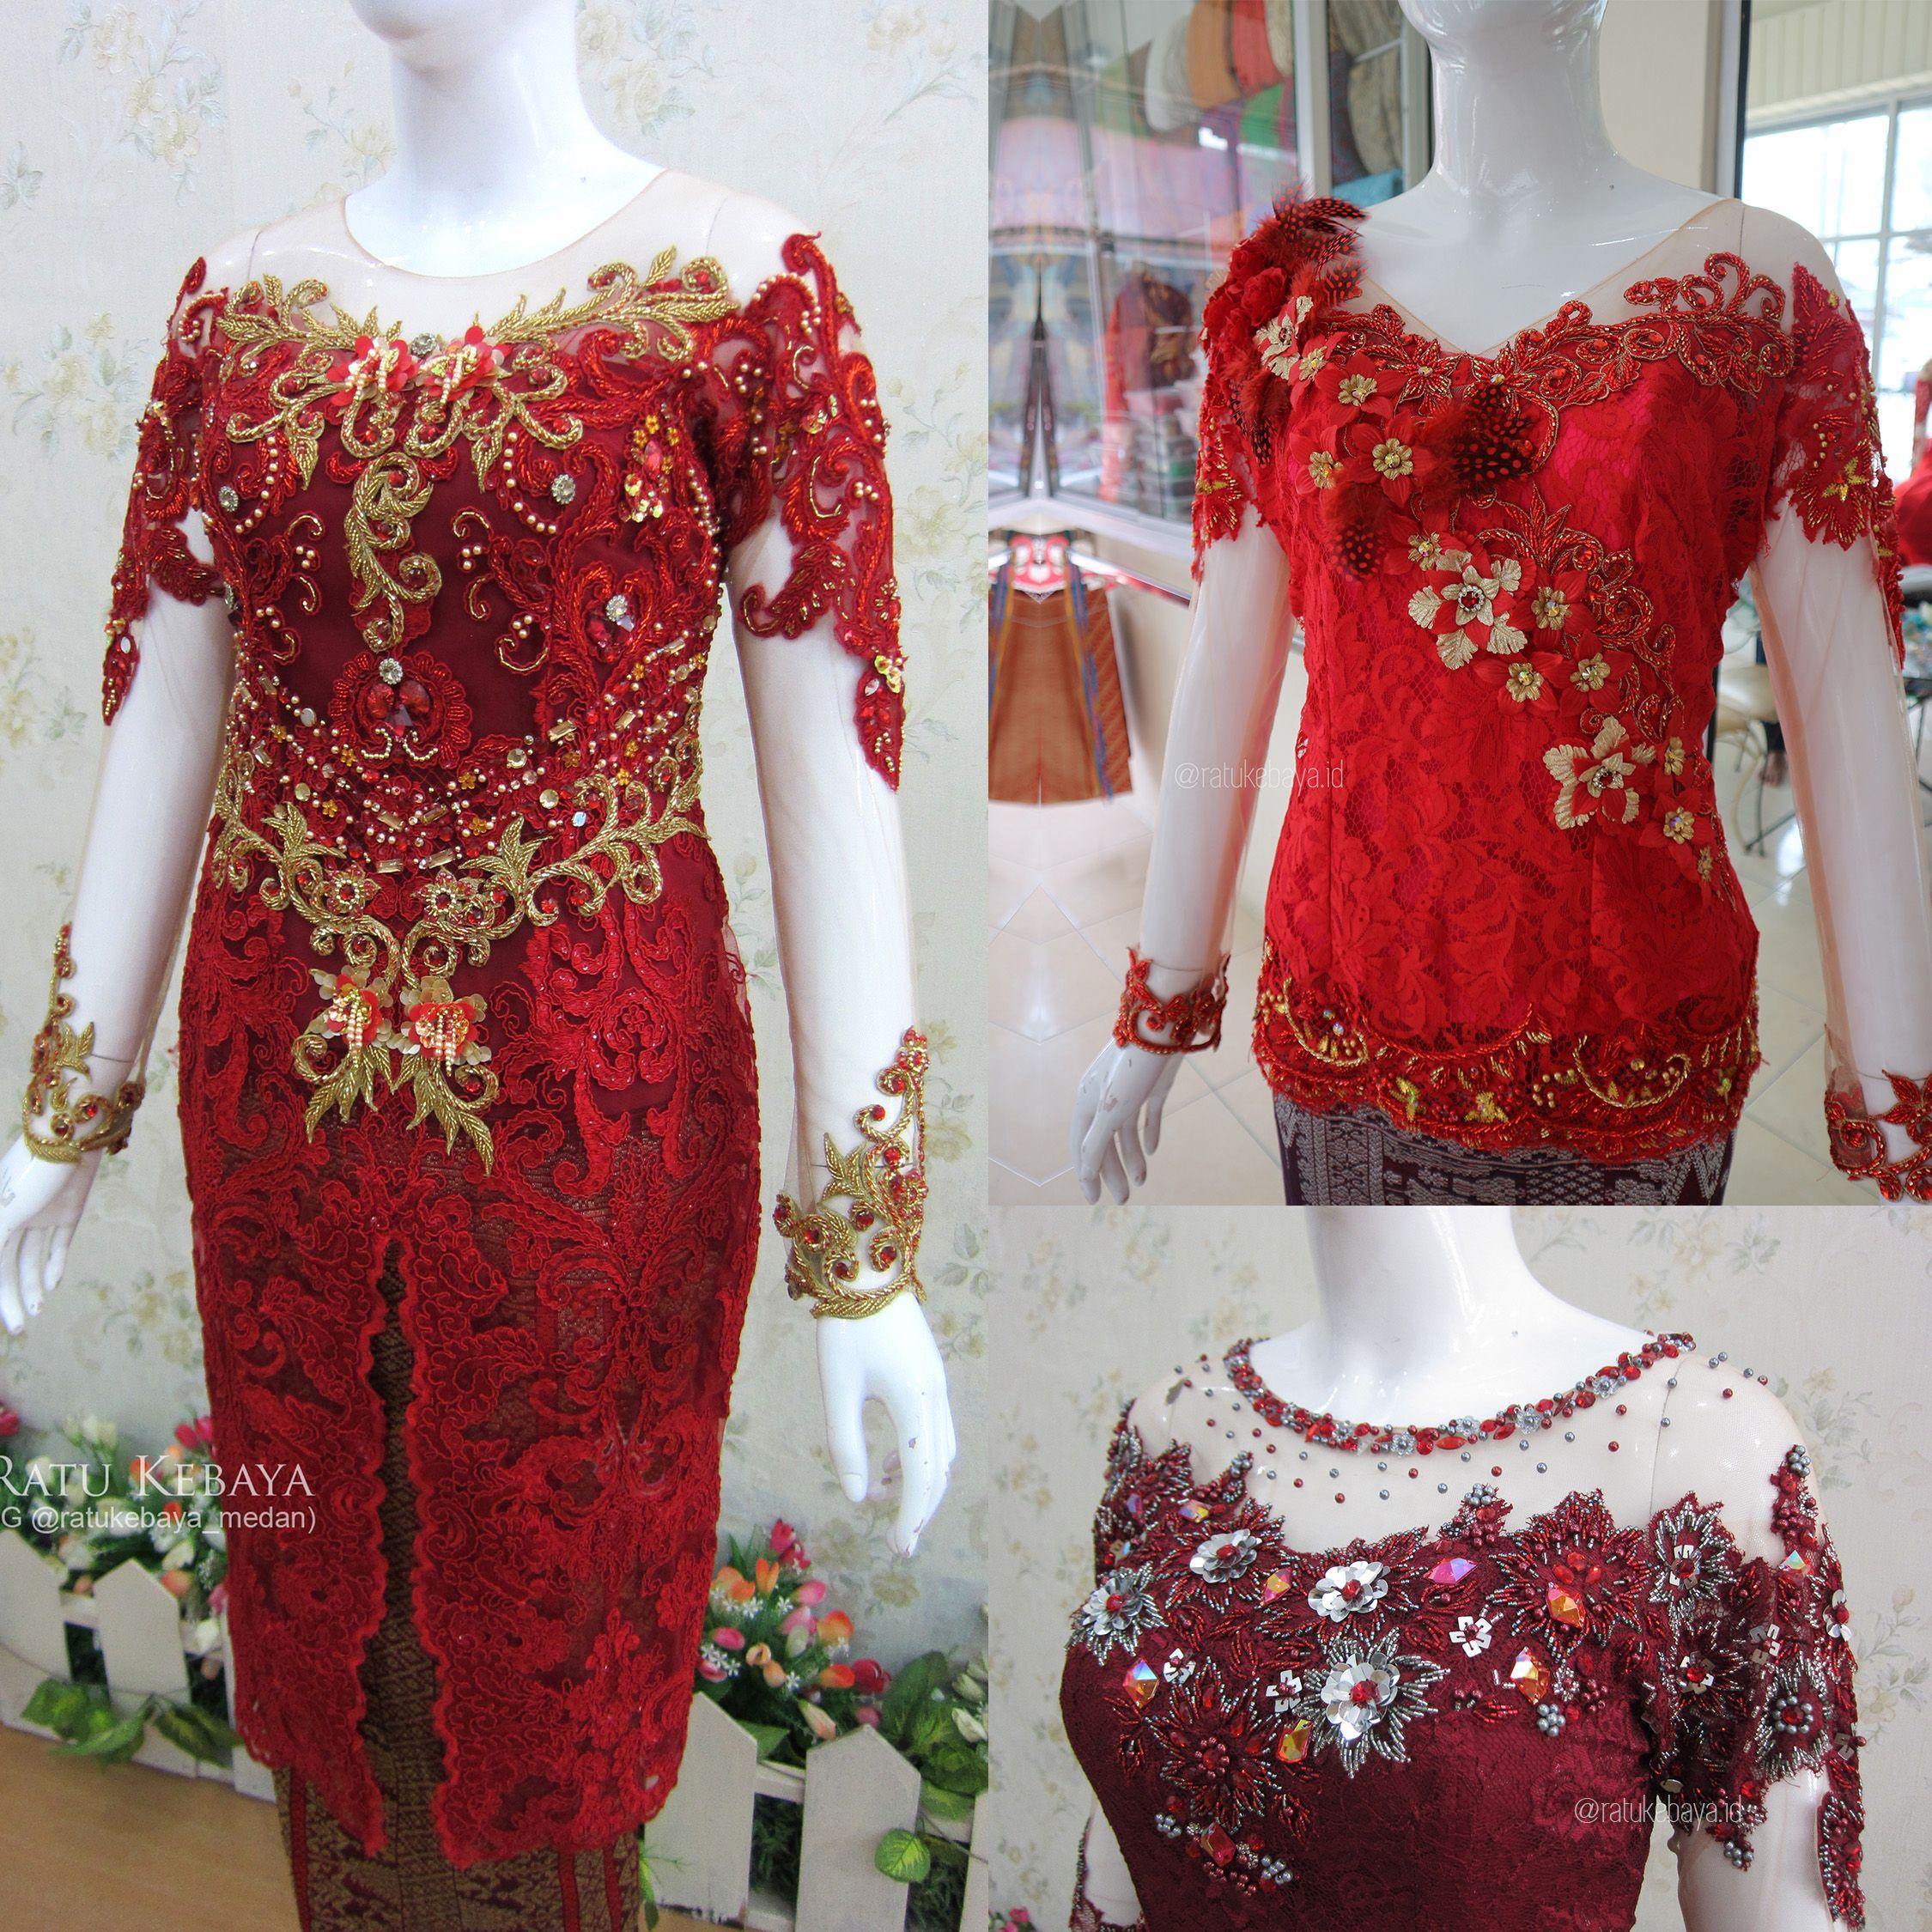 Beading Embellishment Ratukebaya Id Model Pakaian Pakaian Wanita Model Pakaian Wanita